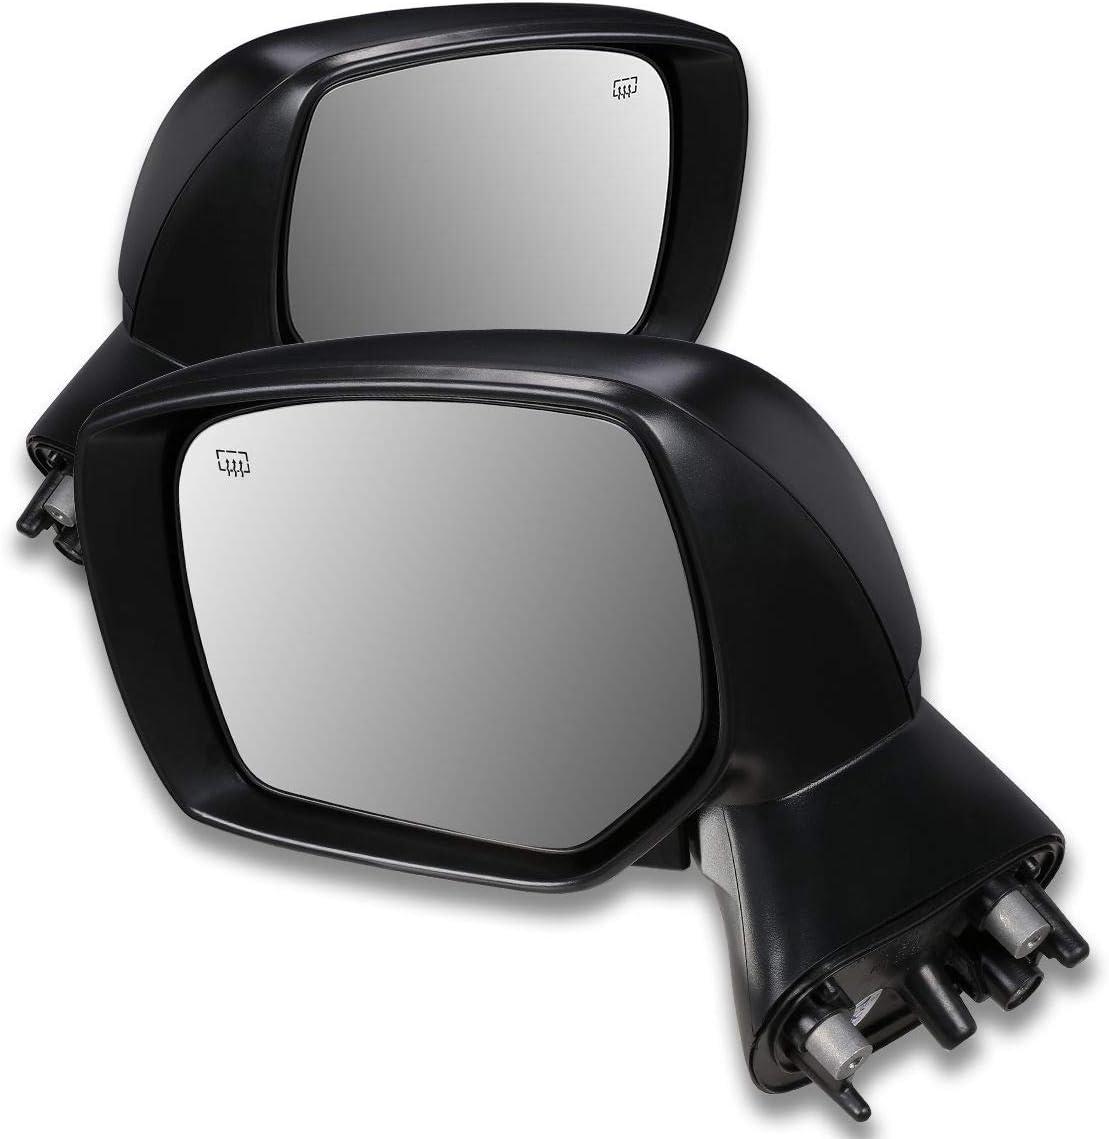 Fits 12-14 Subaru Impreza Xv Crosstrek Passenger Side Mirror Replacement Heate